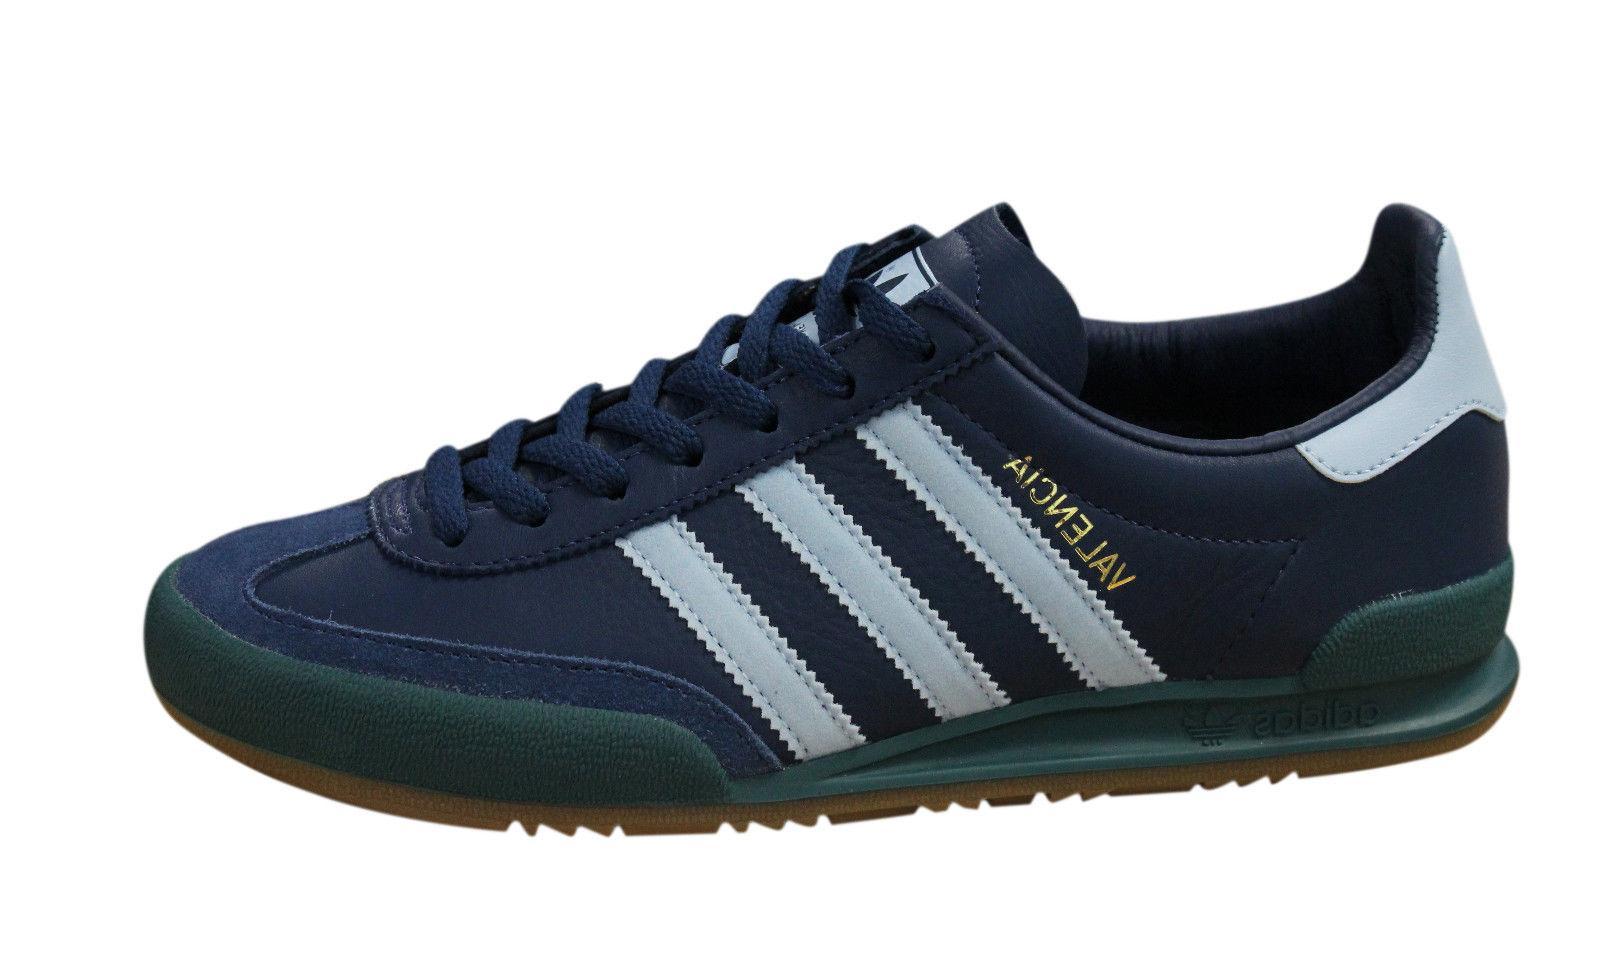 Adidas Originals Jeans City Series Valencia Mens Lace Up Tra